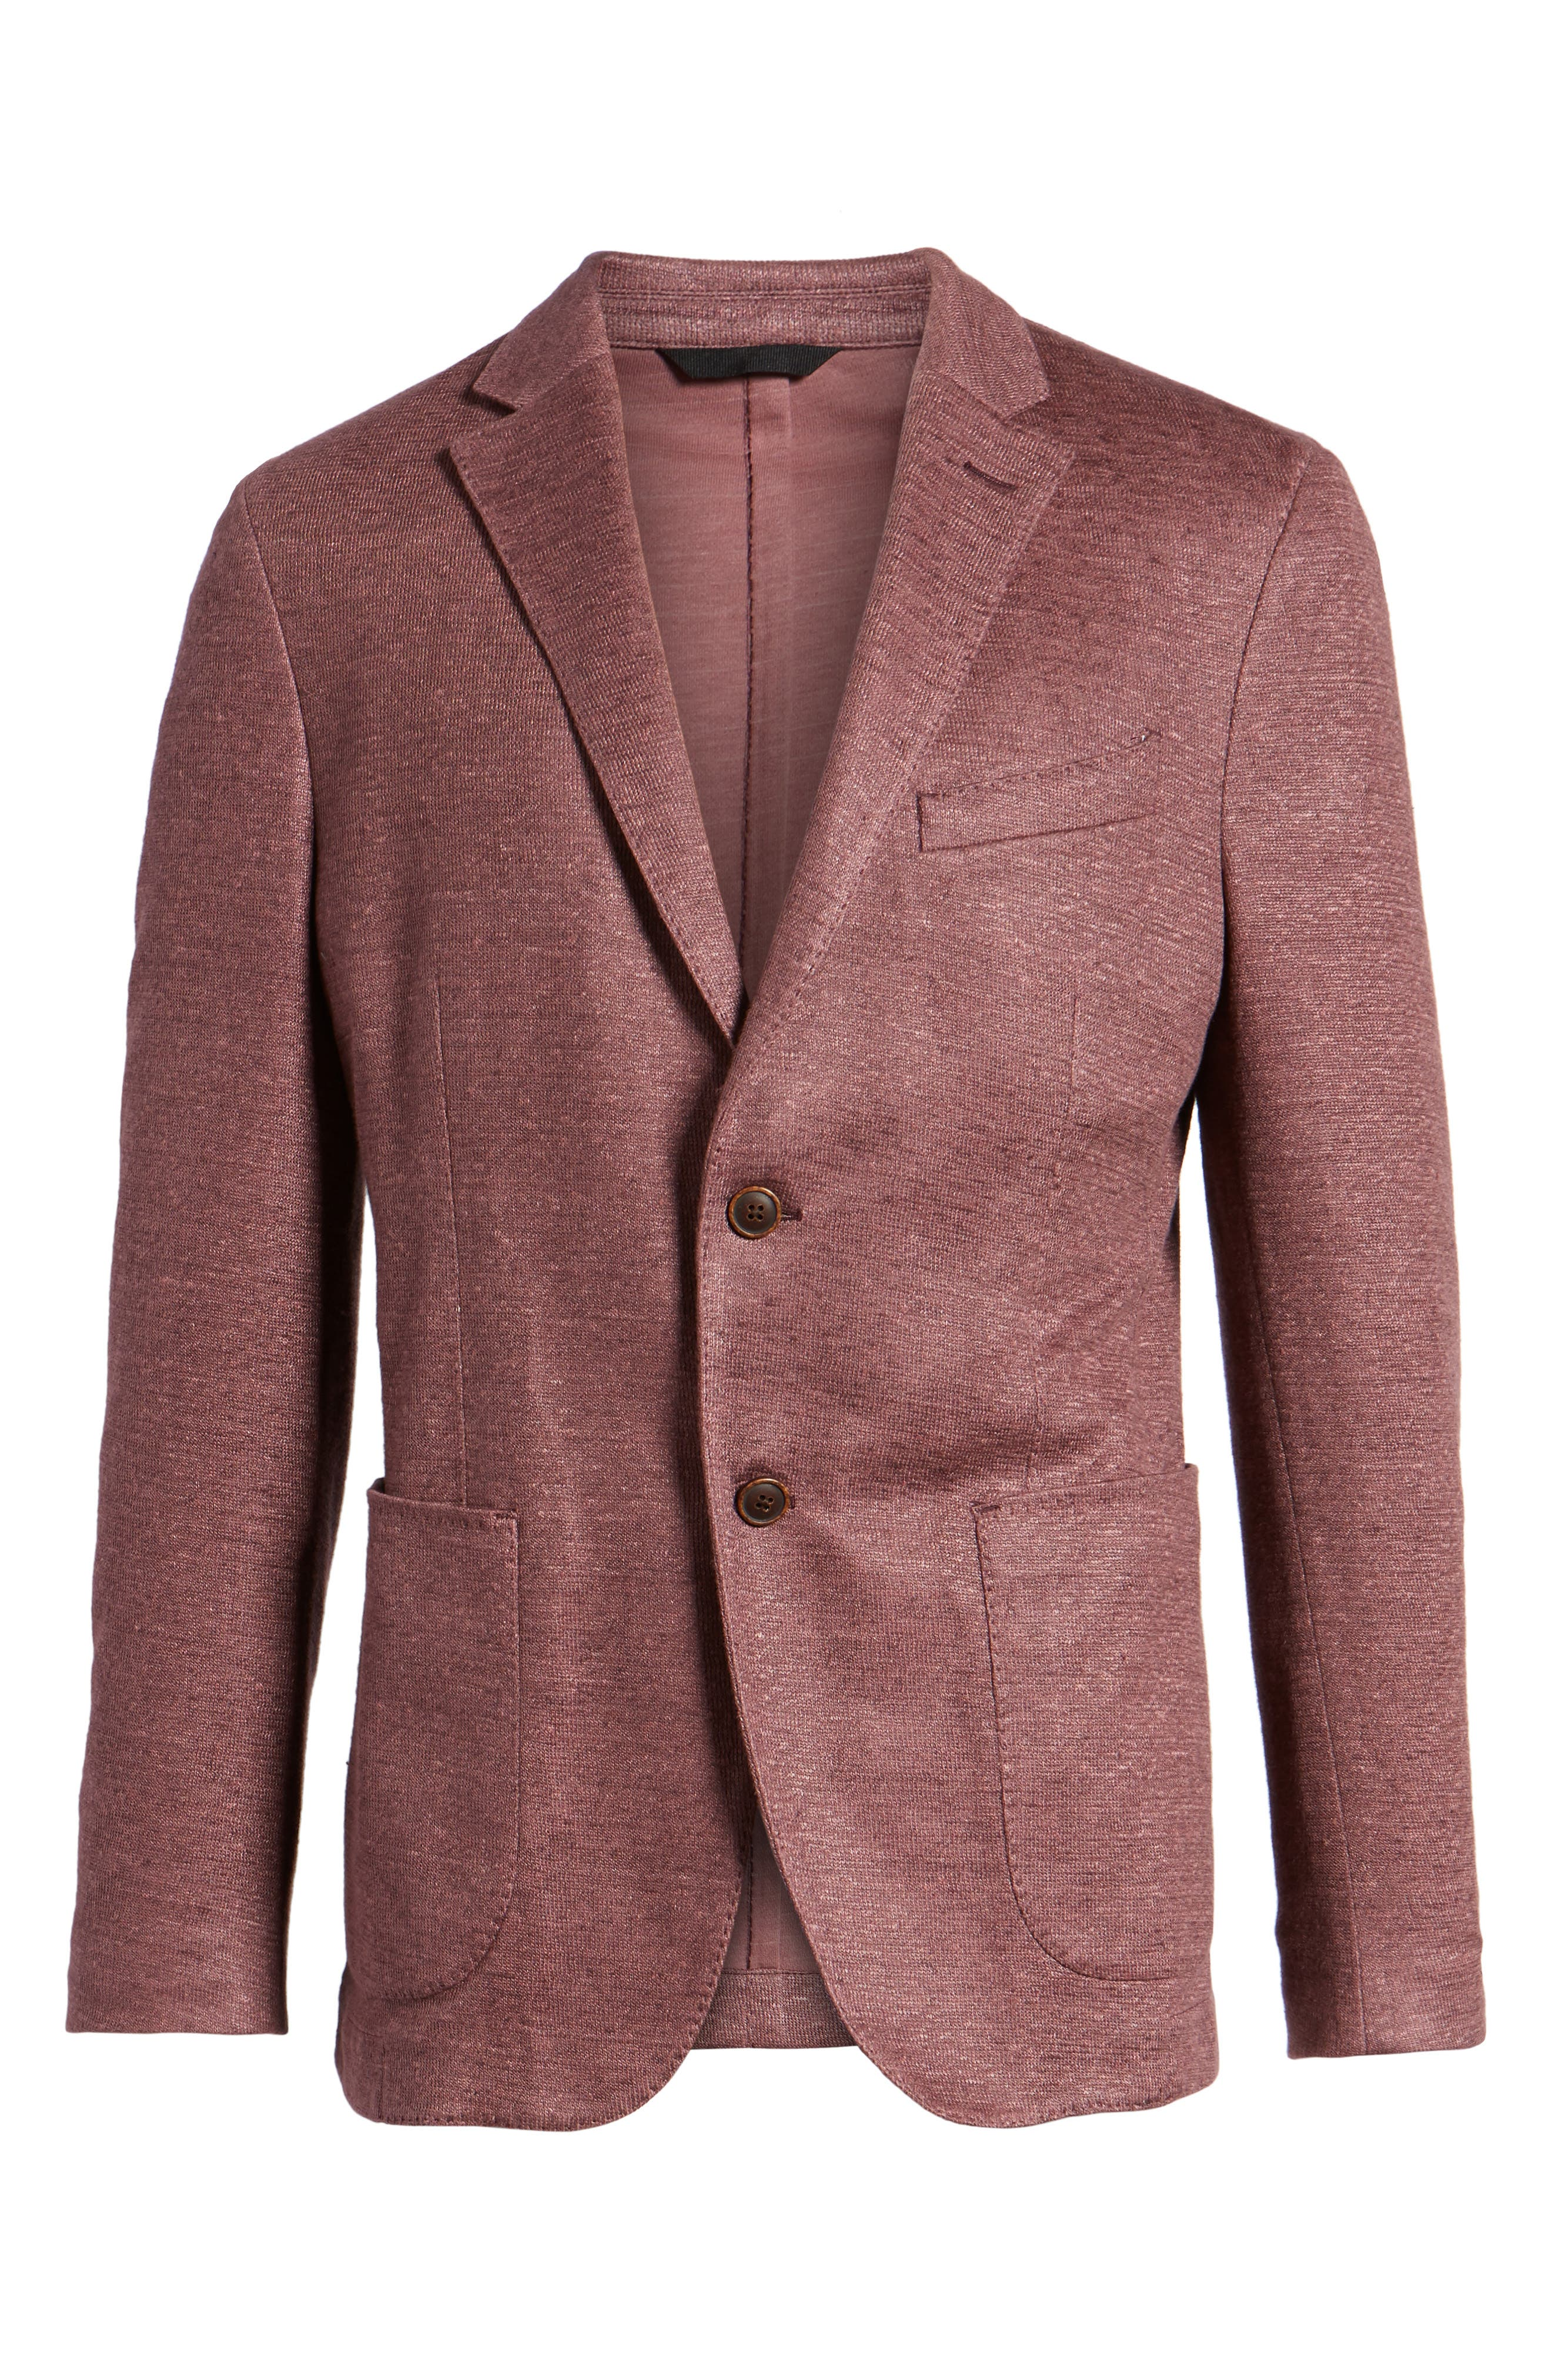 Trim Fit Heathered Jersey Blazer,                             Alternate thumbnail 5, color,                             651